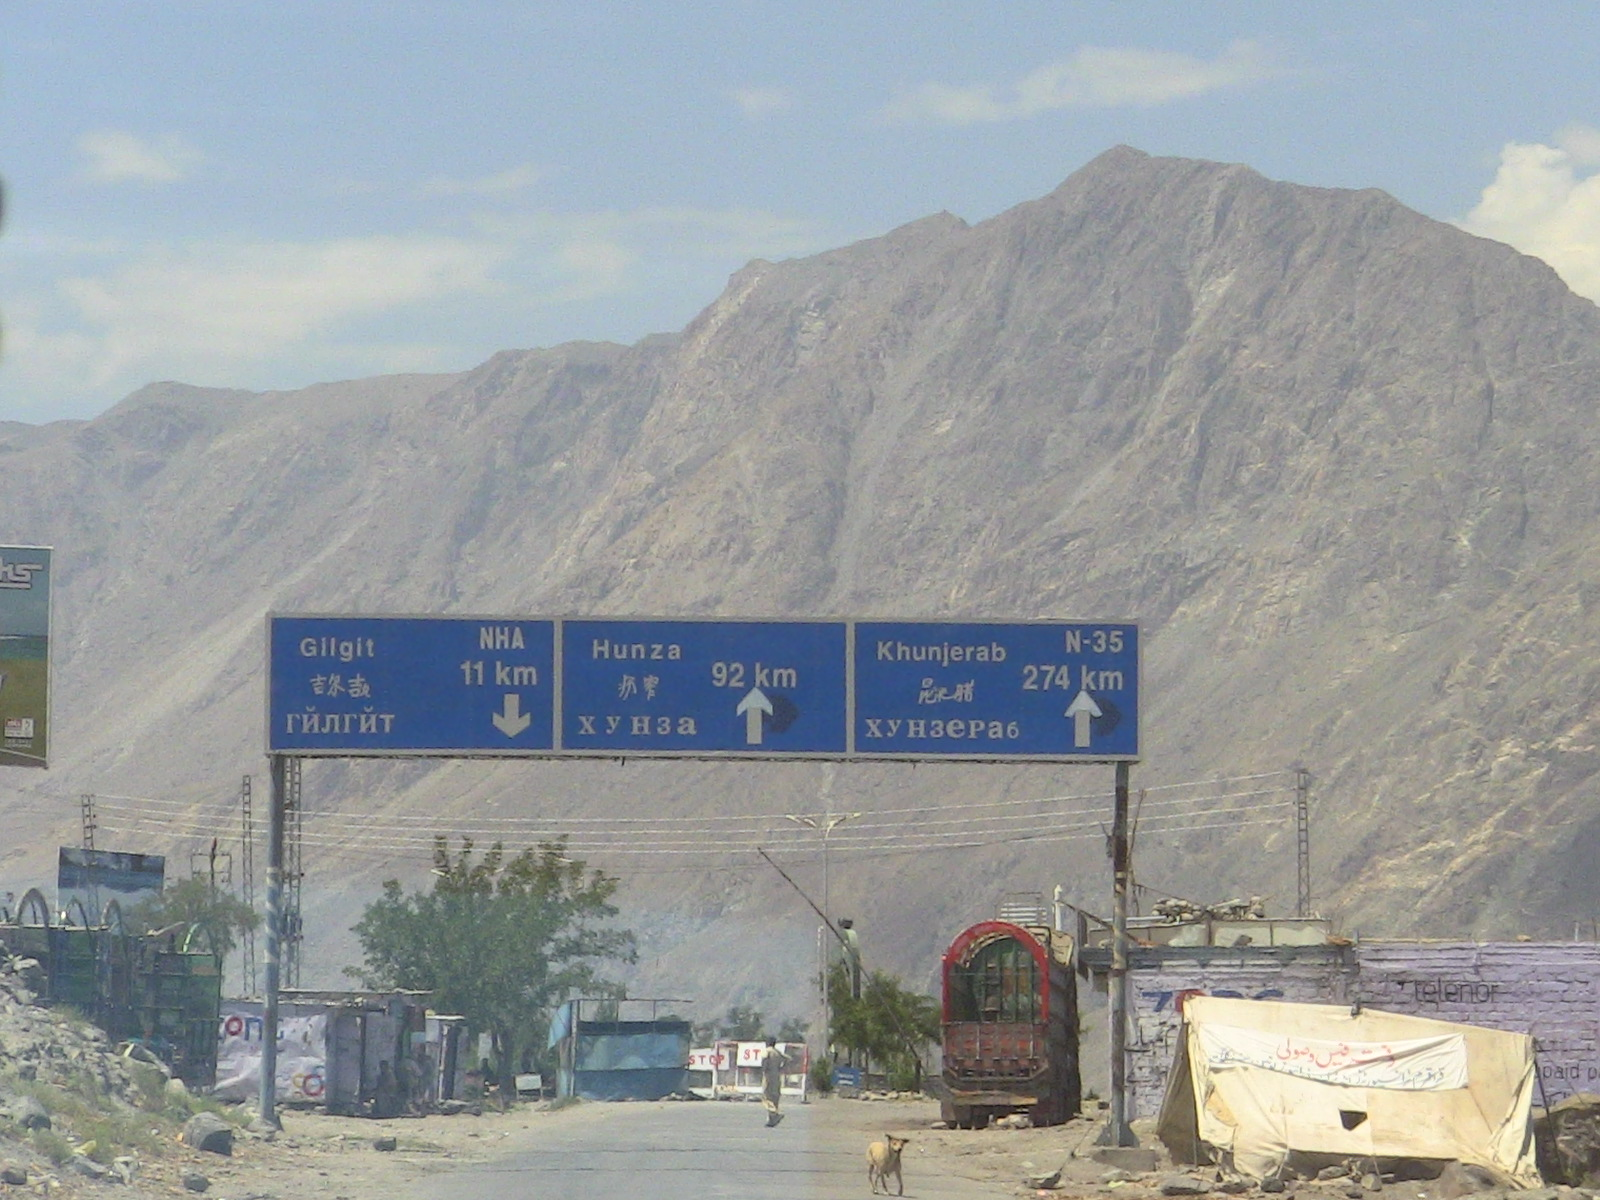 Gilgit_arrival